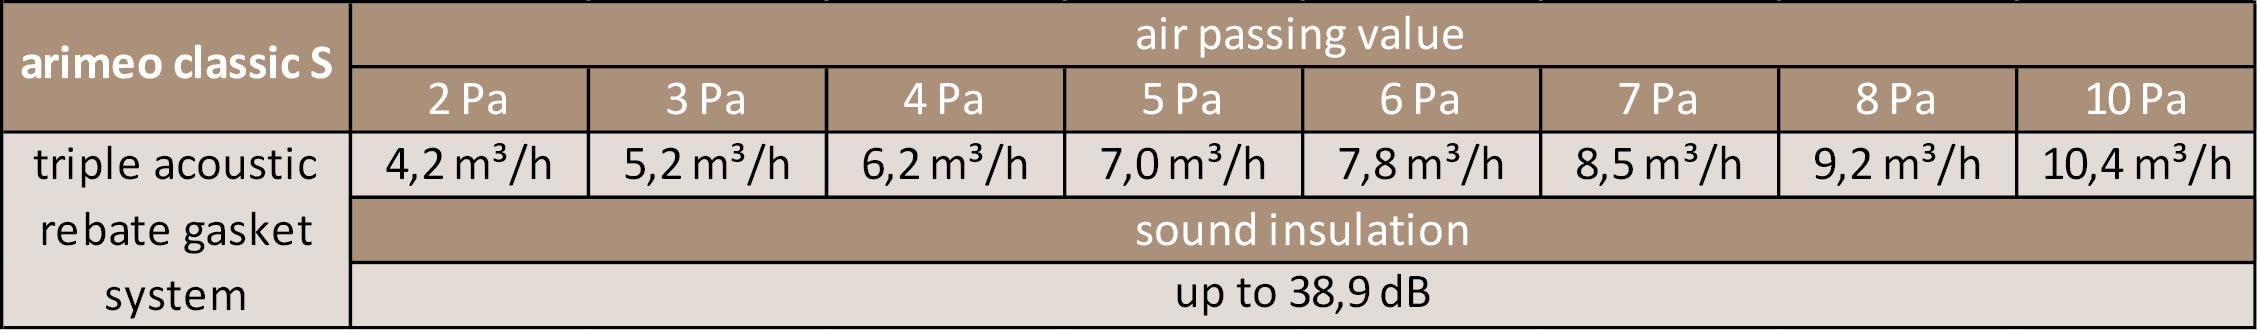 arimeo classic S performance data triple acoustic